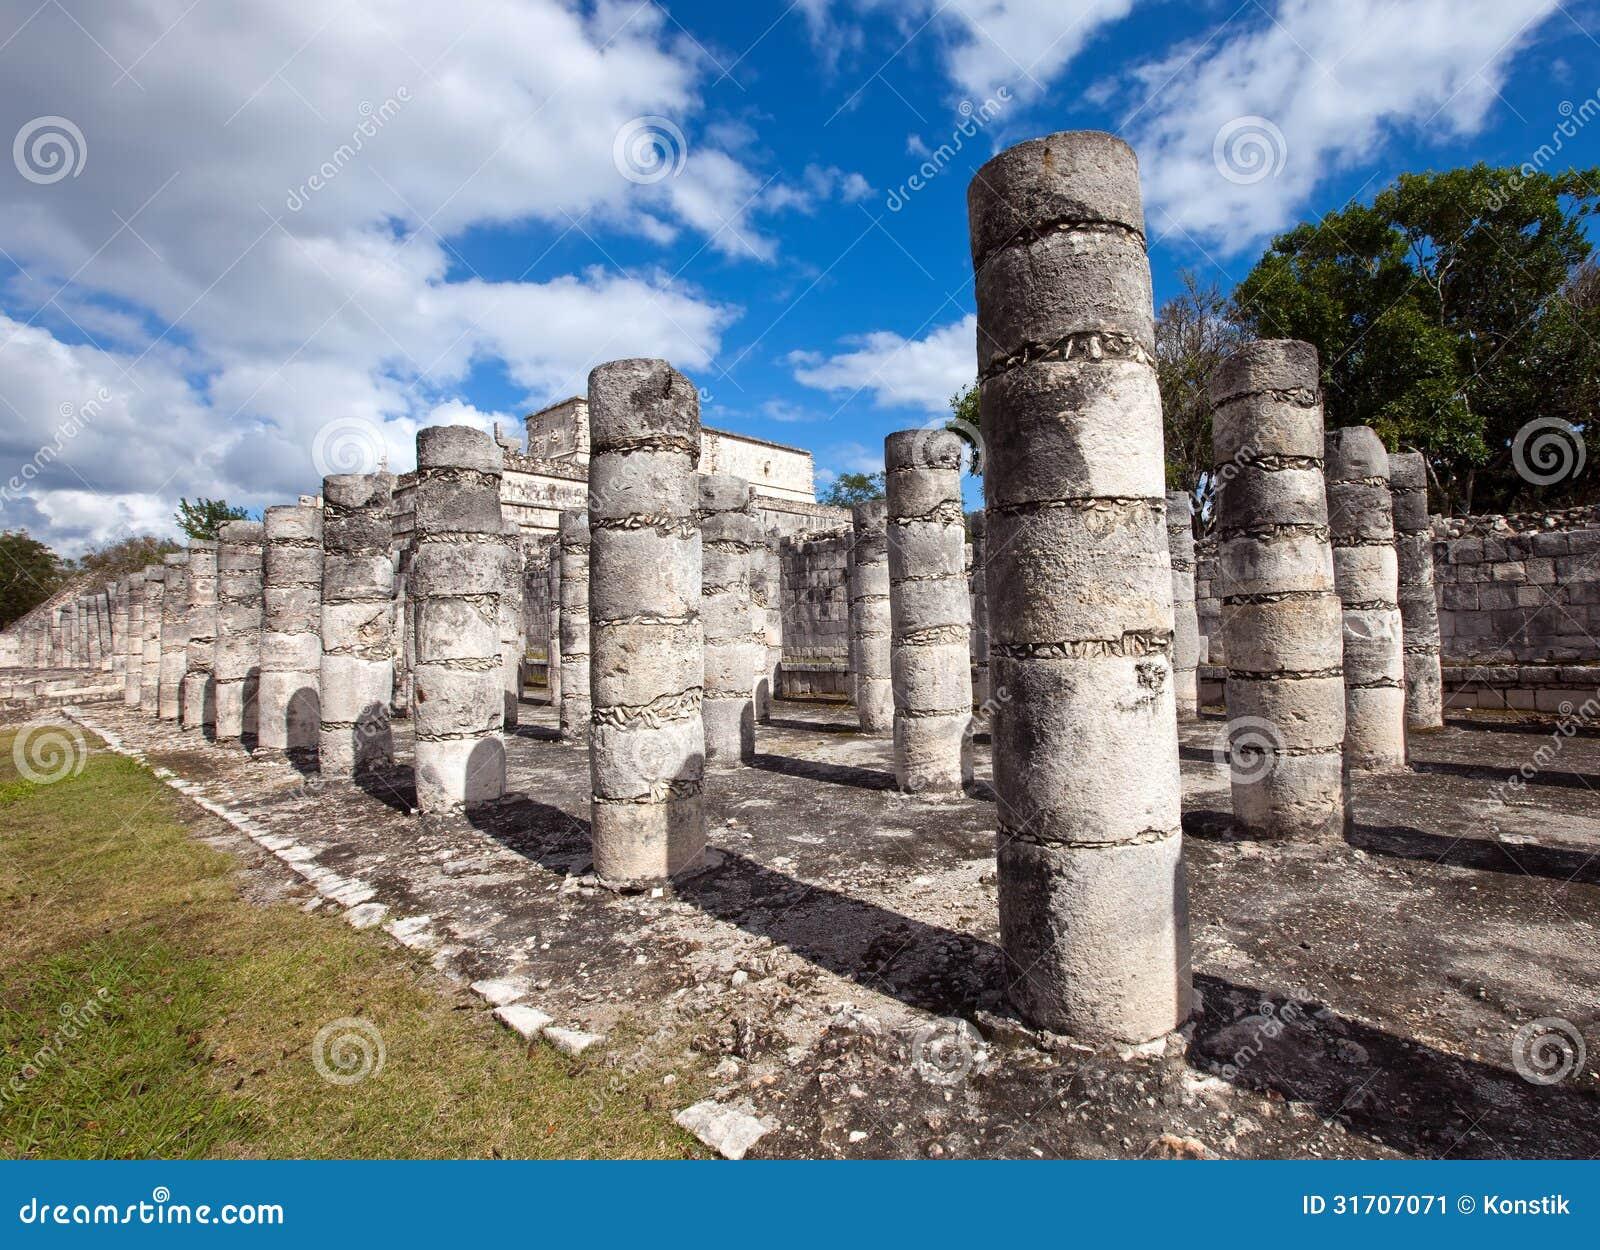 Ancient Stone Pillars : Ancient stone columns ichen itza mexico stock image